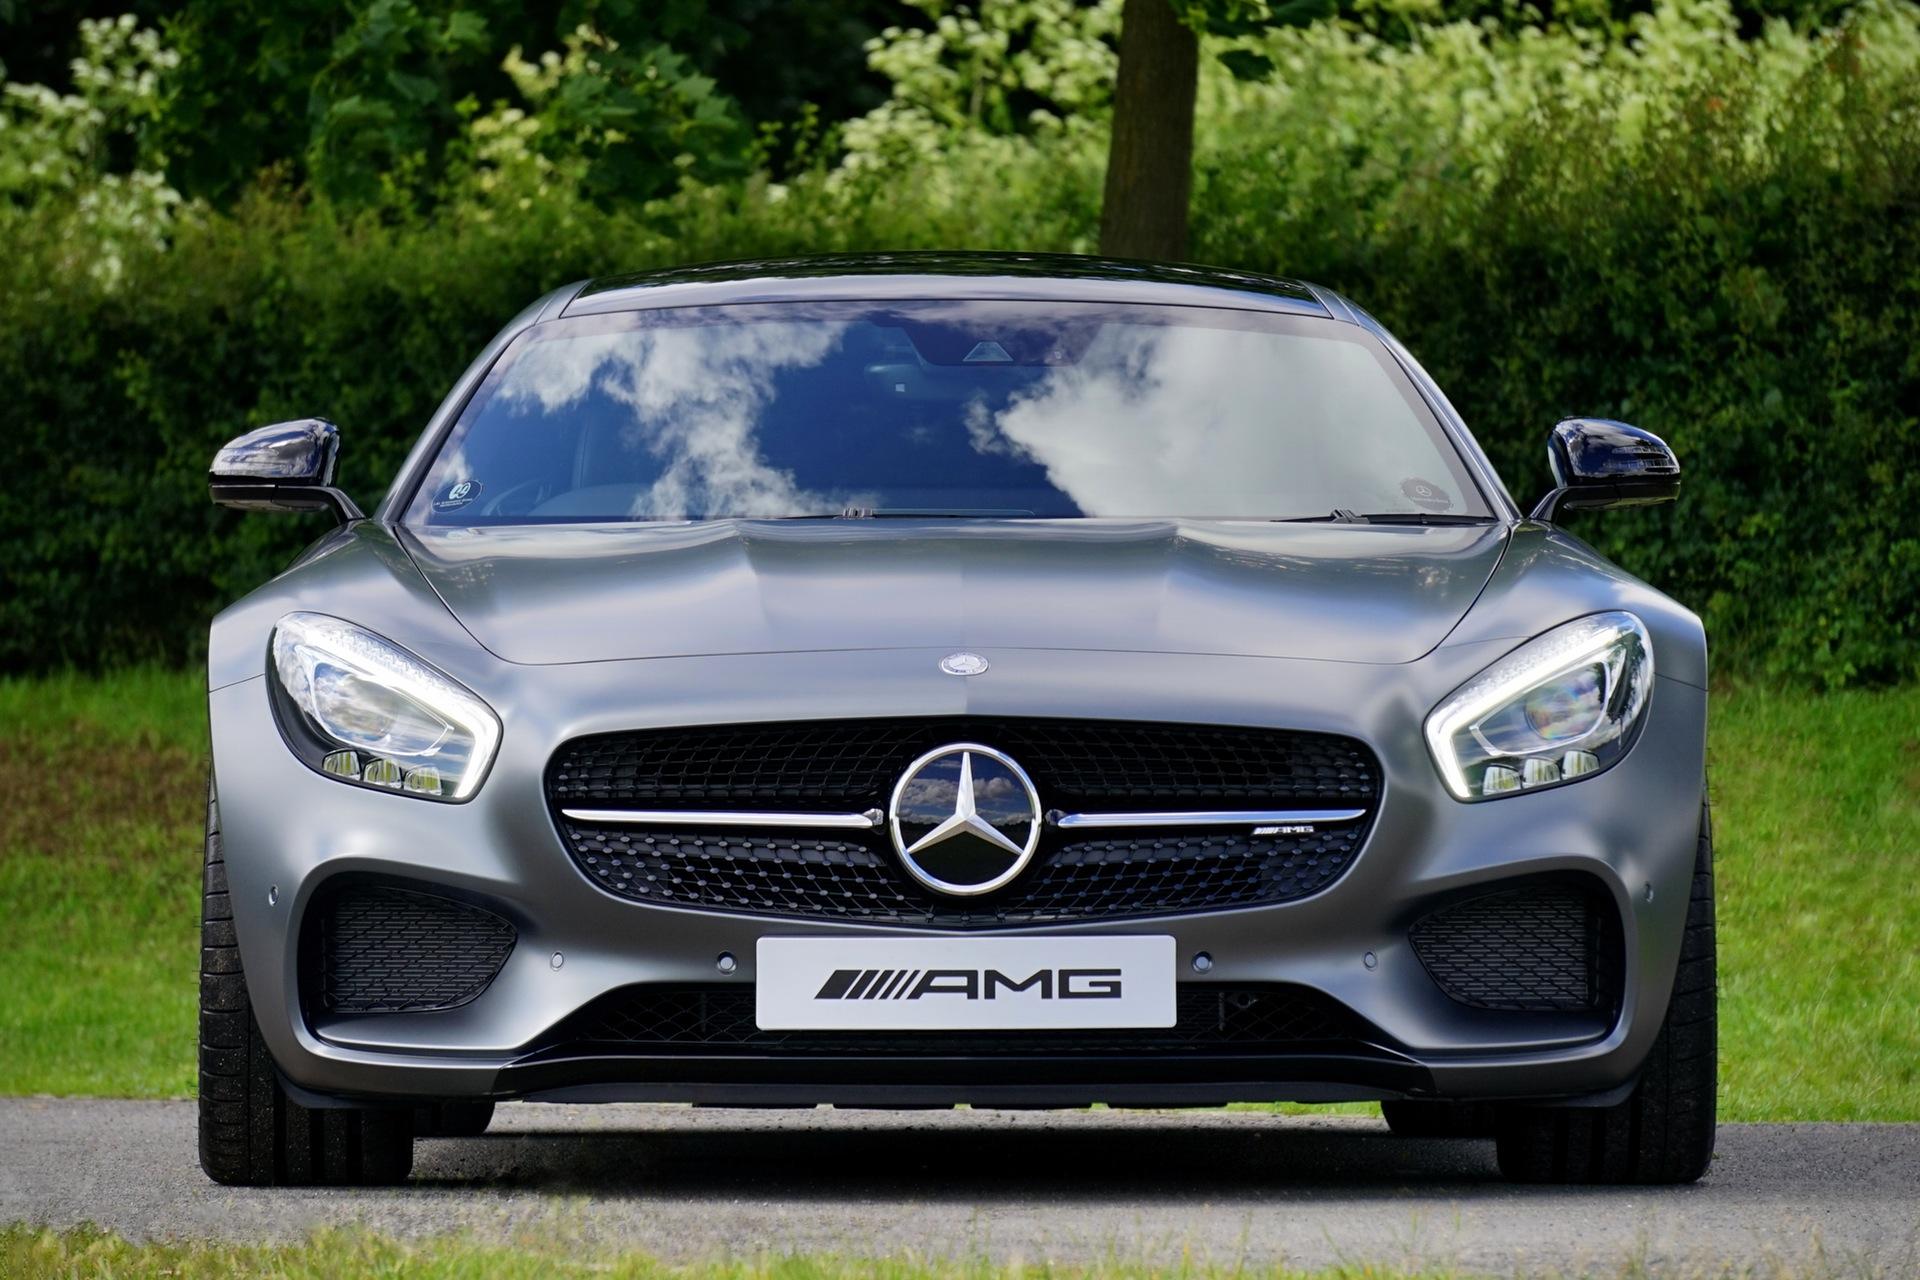 carro, luxo, esportes, Mercedes, Elite, Benz - Papéis de parede HD - Professor-falken.com